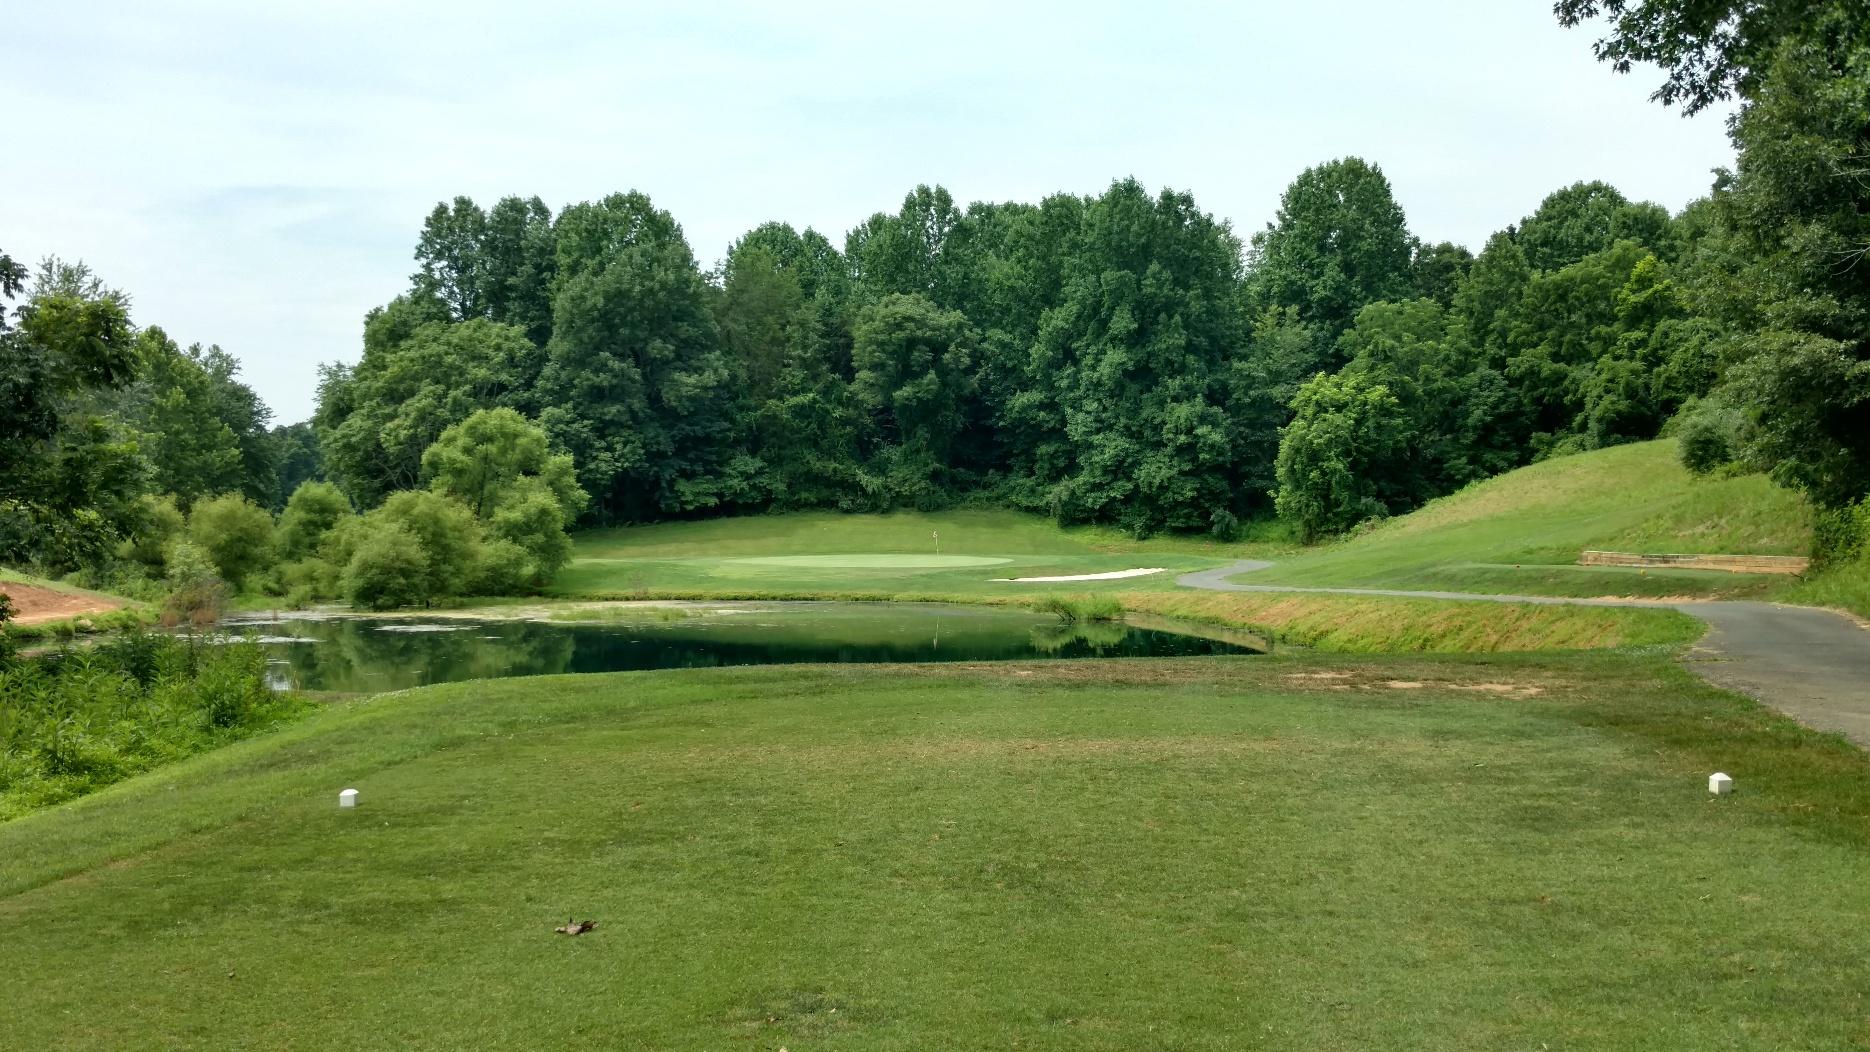 South Wales Golf Course (Jeffersonton, VA on 07/04/17)